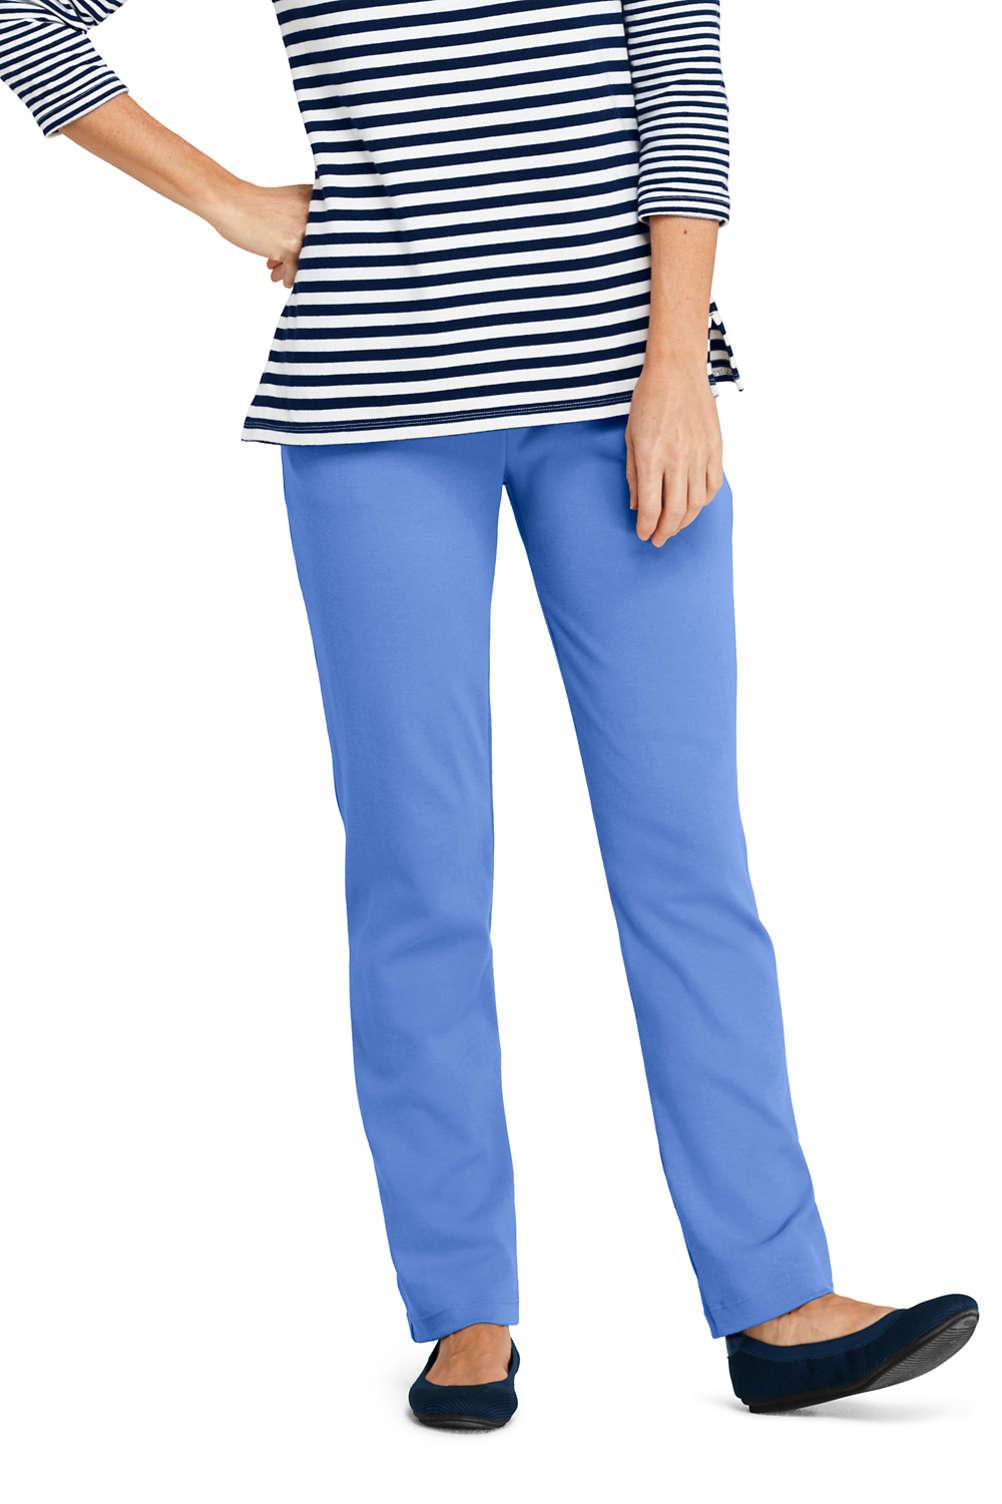 7af864b7a71 Women s Sport Knit Elastic Waist Pants High Rise. Item  094026AH0. View  Fullscreen